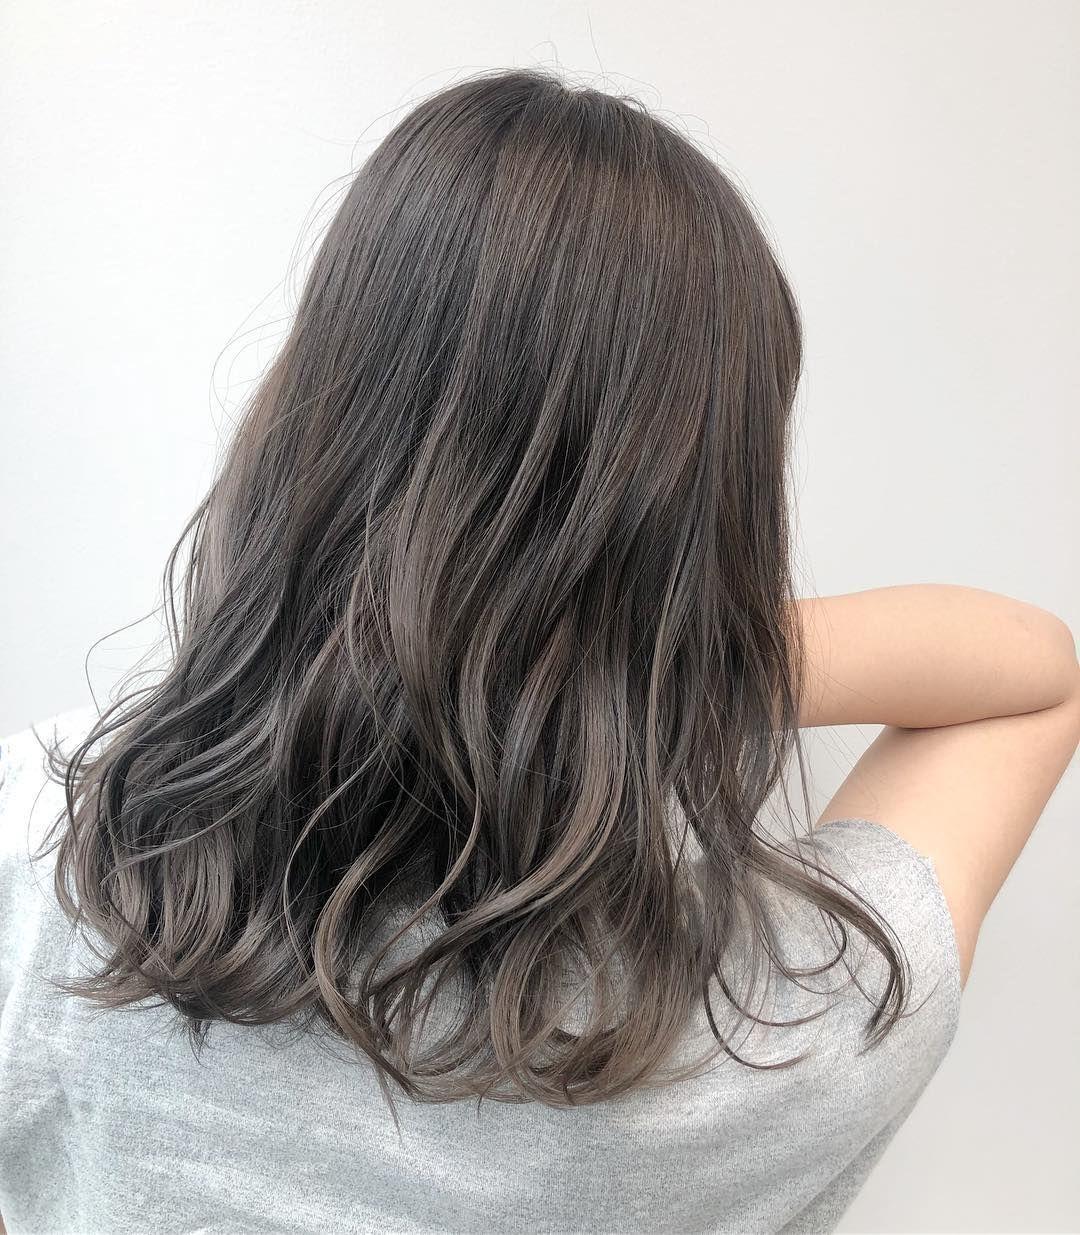 Ghim Của めぐみ 福冨 Tren Hair Color Trong 2020 Toc Va Lam đẹp